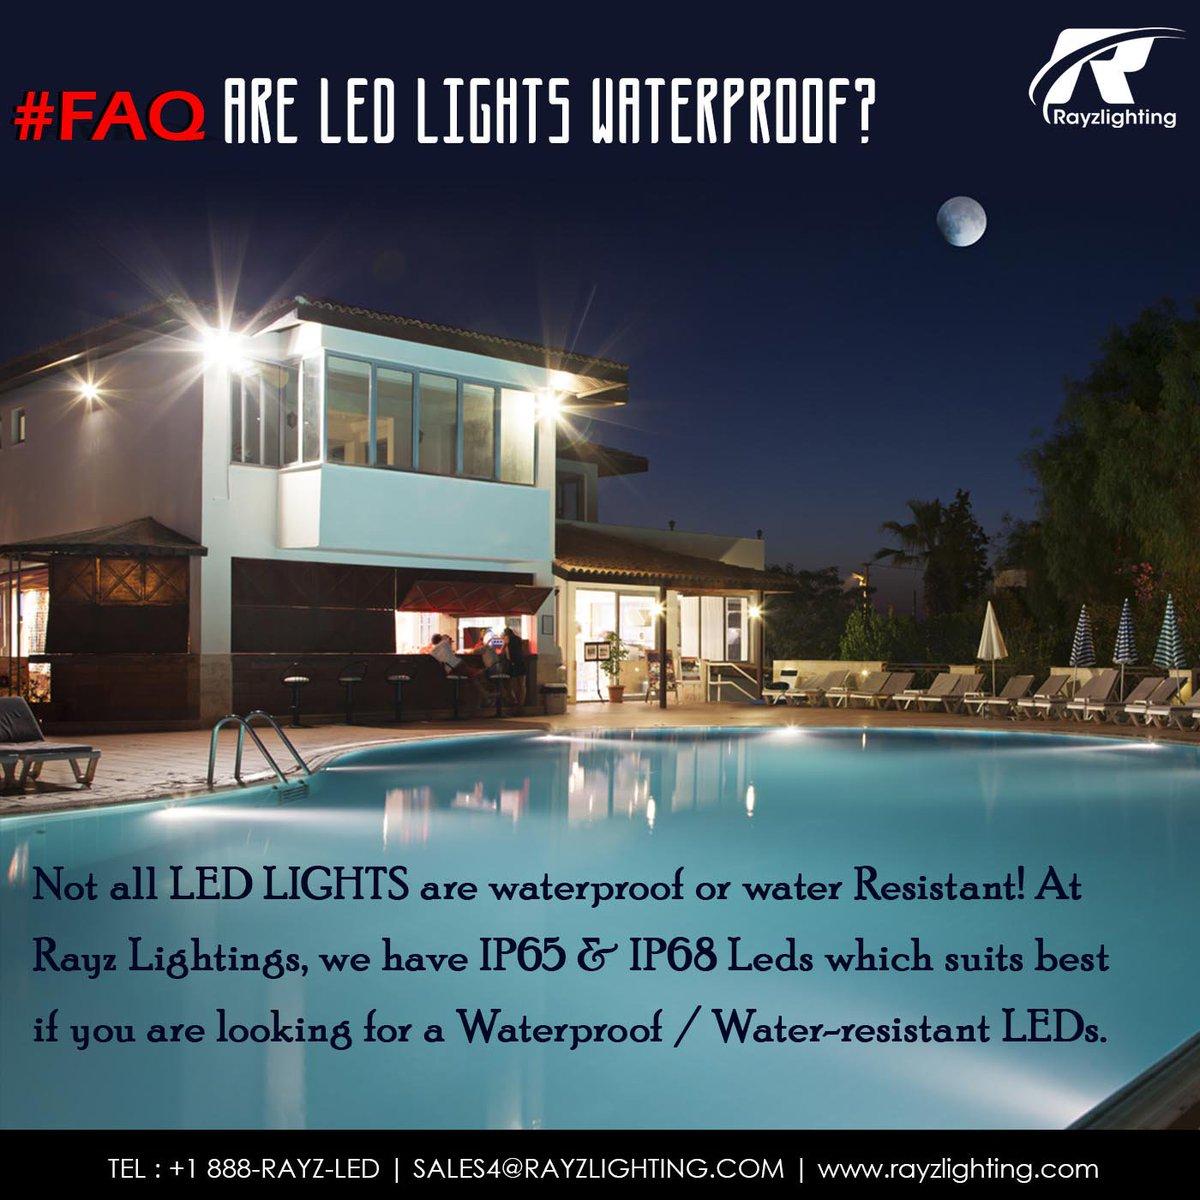 Are LED Lights WaterProof? Not all LED LIGHTS are waterproof or Water Resistant! At Rayz Lightings, we have IP65 & IP68 Leds which suits best if you are looking for a waterproof/water-resistant LEDs.   #rayz #rayzlighting #resellerusa #rebate #rebatedeals #rebates #rebateprogram pic.twitter.com/gFp1sSEDOC